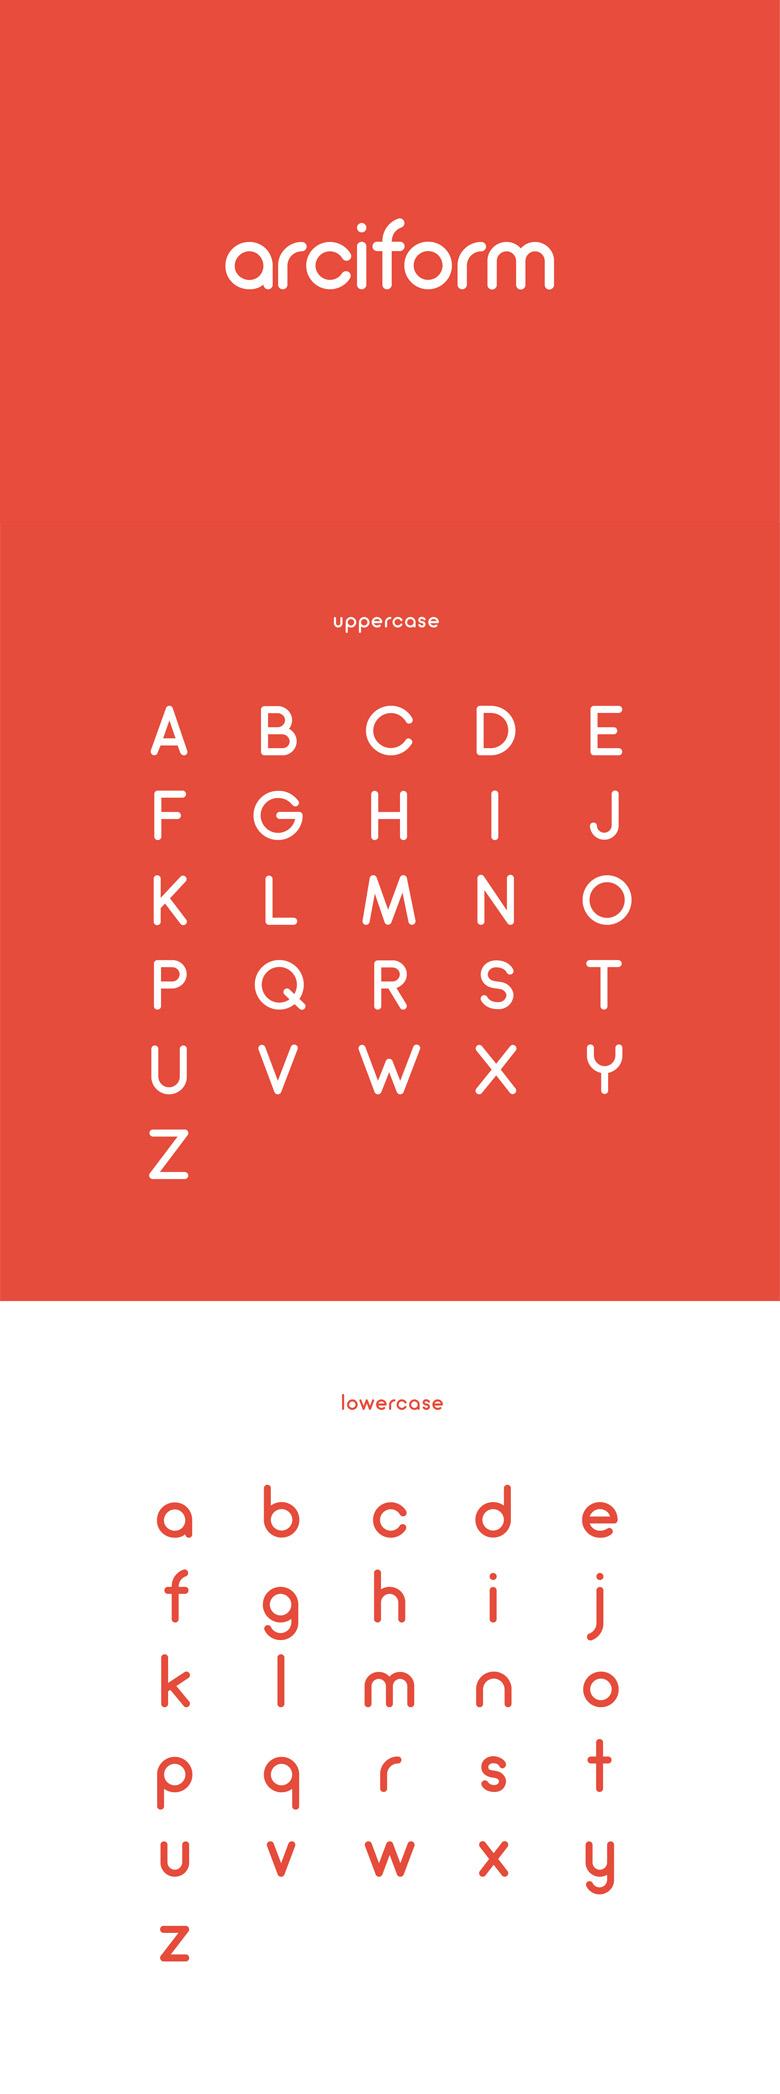 Beautiful free fonts for designers - Arciform